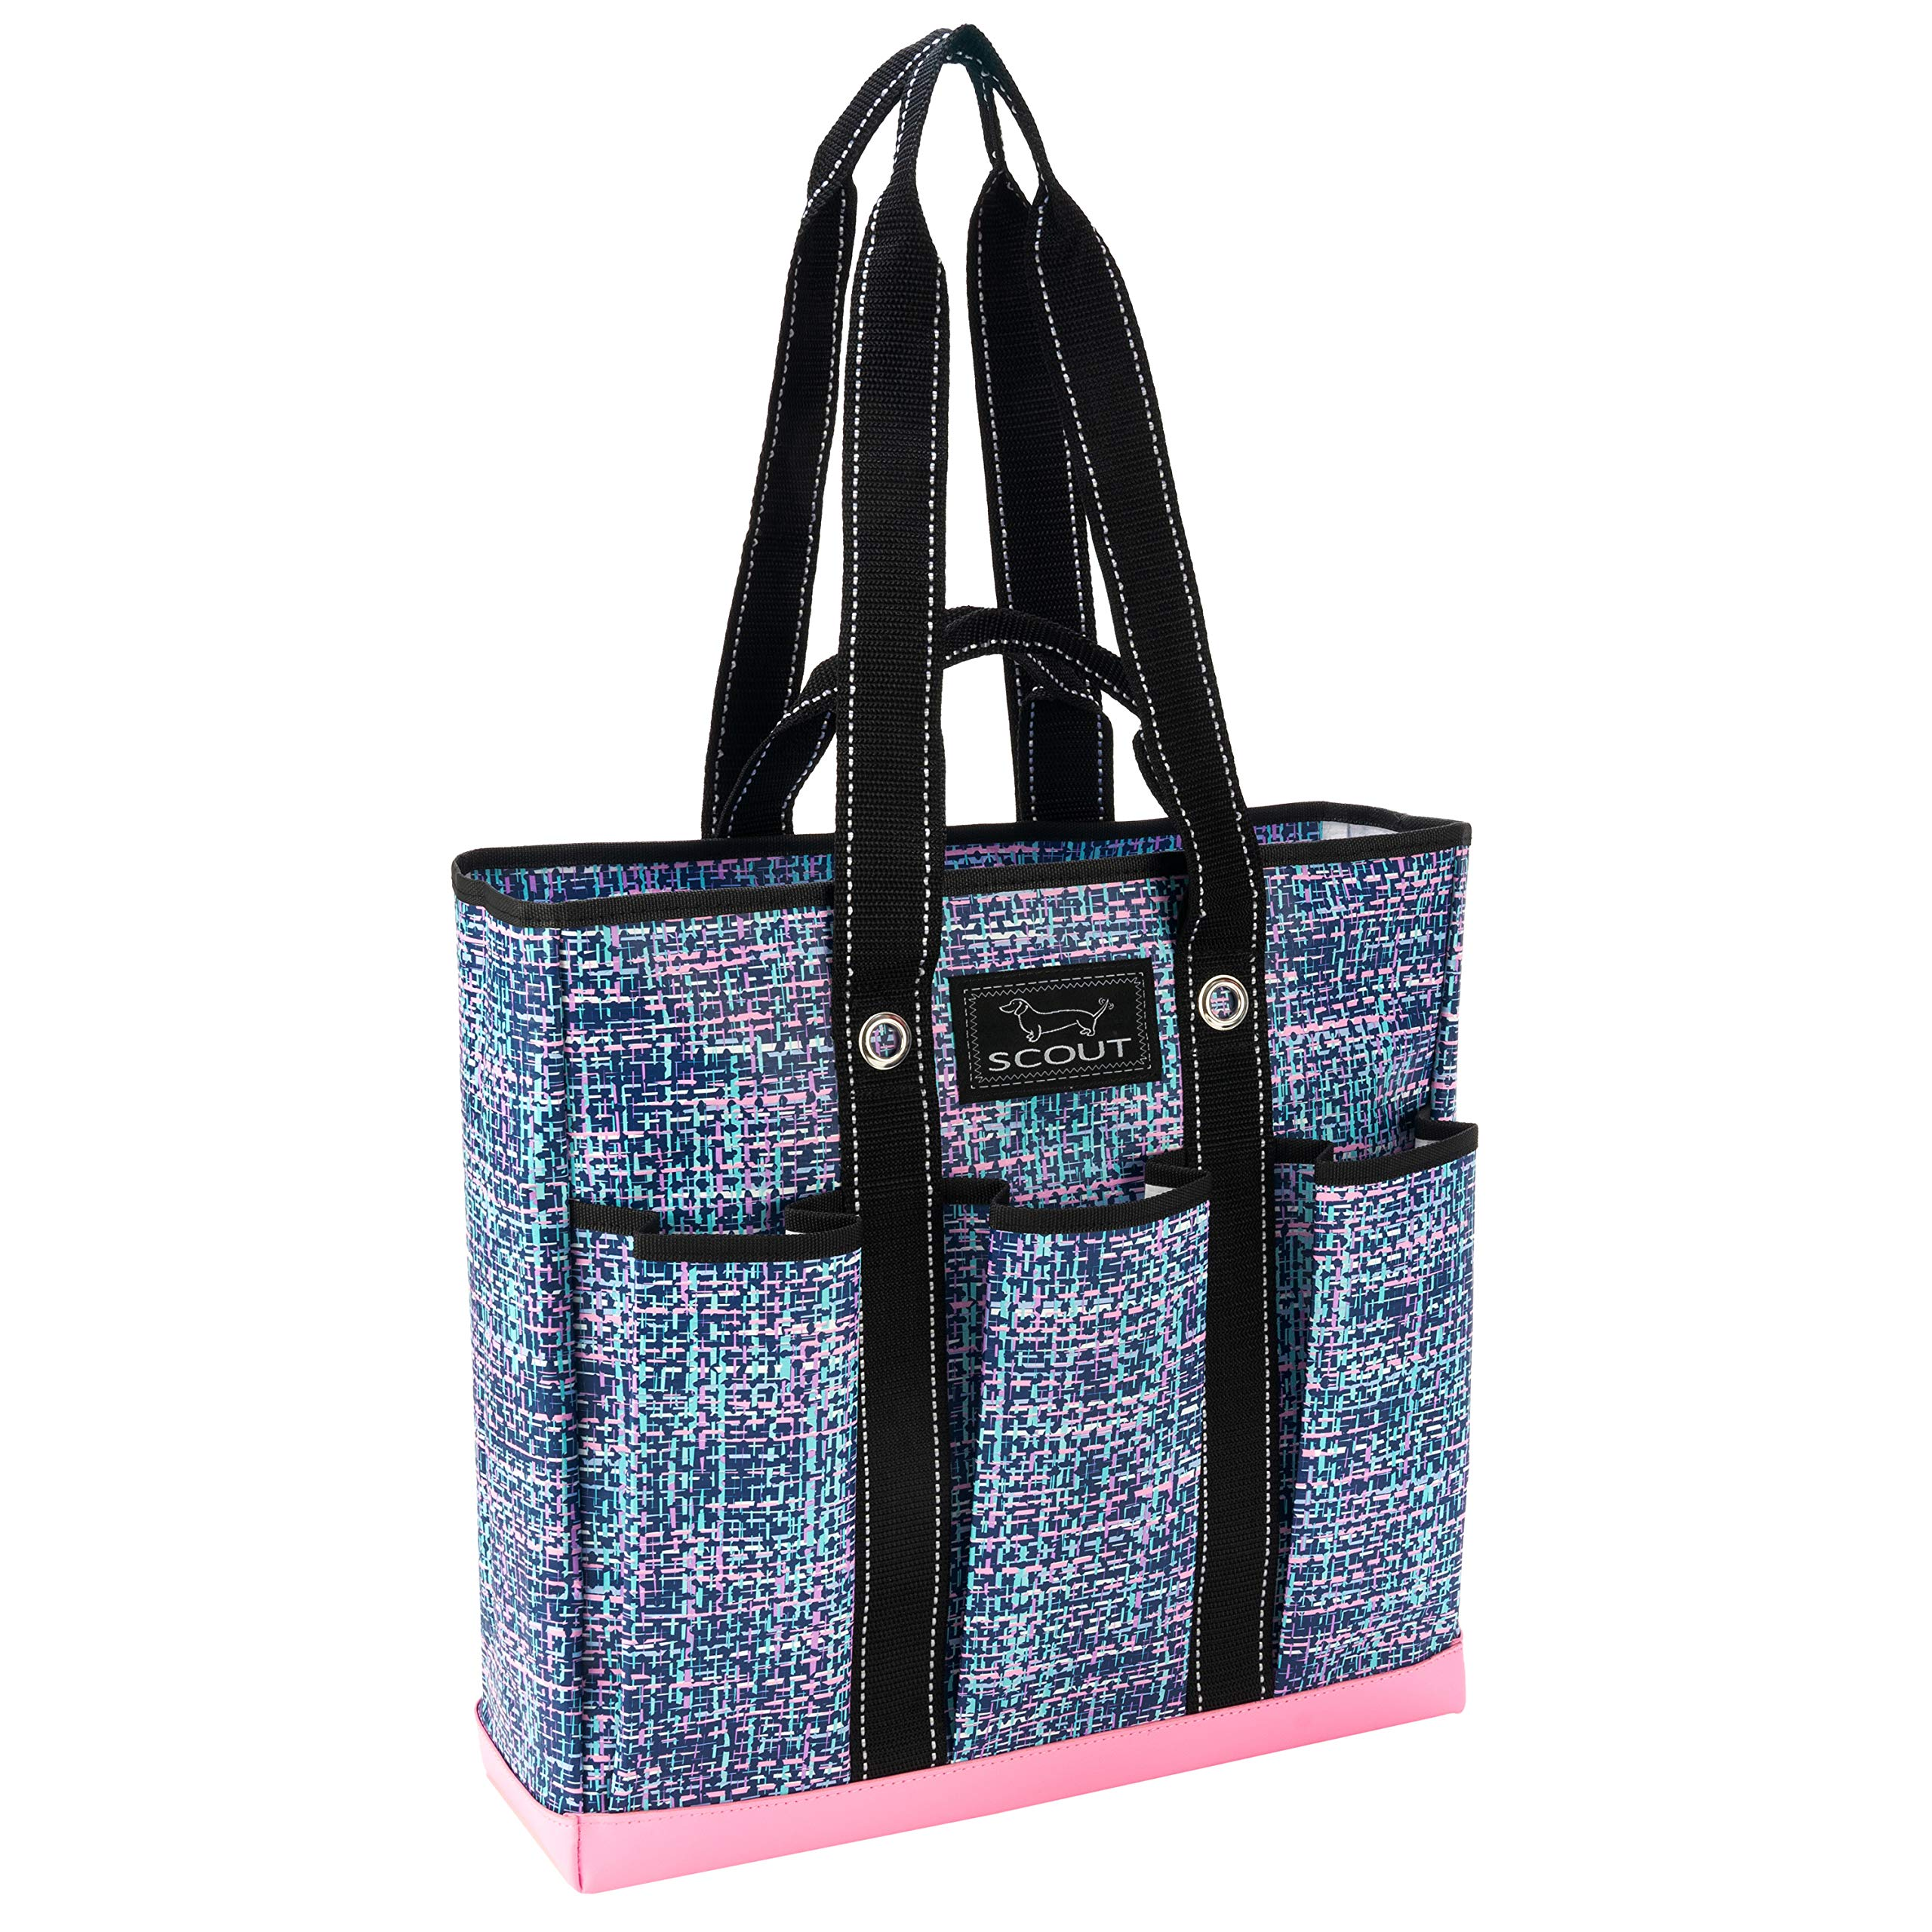 SCOUT Pocket Rocket Multi-Pocket Tote Bag, 6 Exterior Pockets, Water Resistant, Tweedy Bird